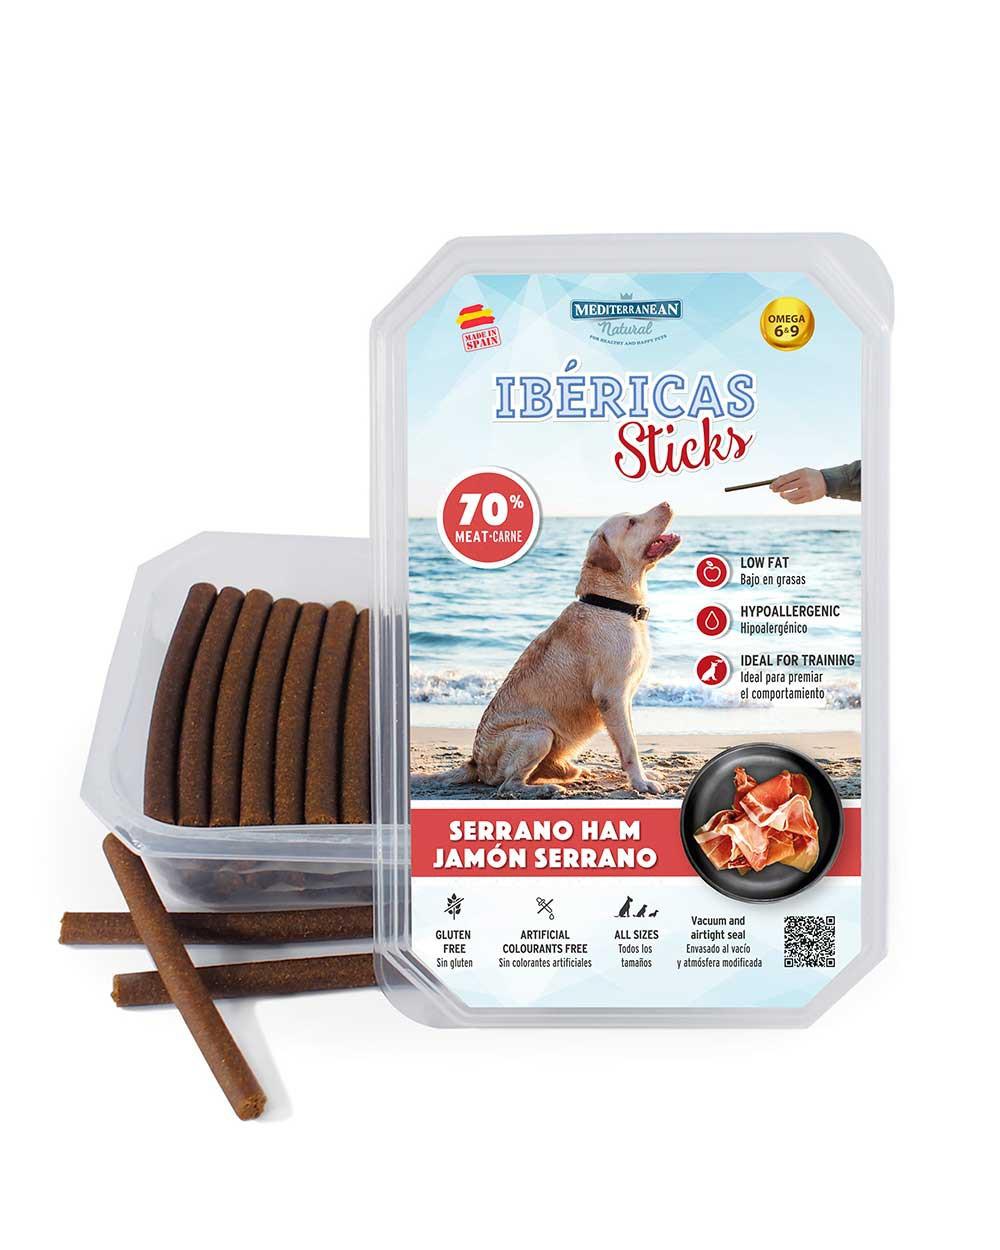 ibericas sticks de jamón serrano para perros Mediterranean Natural